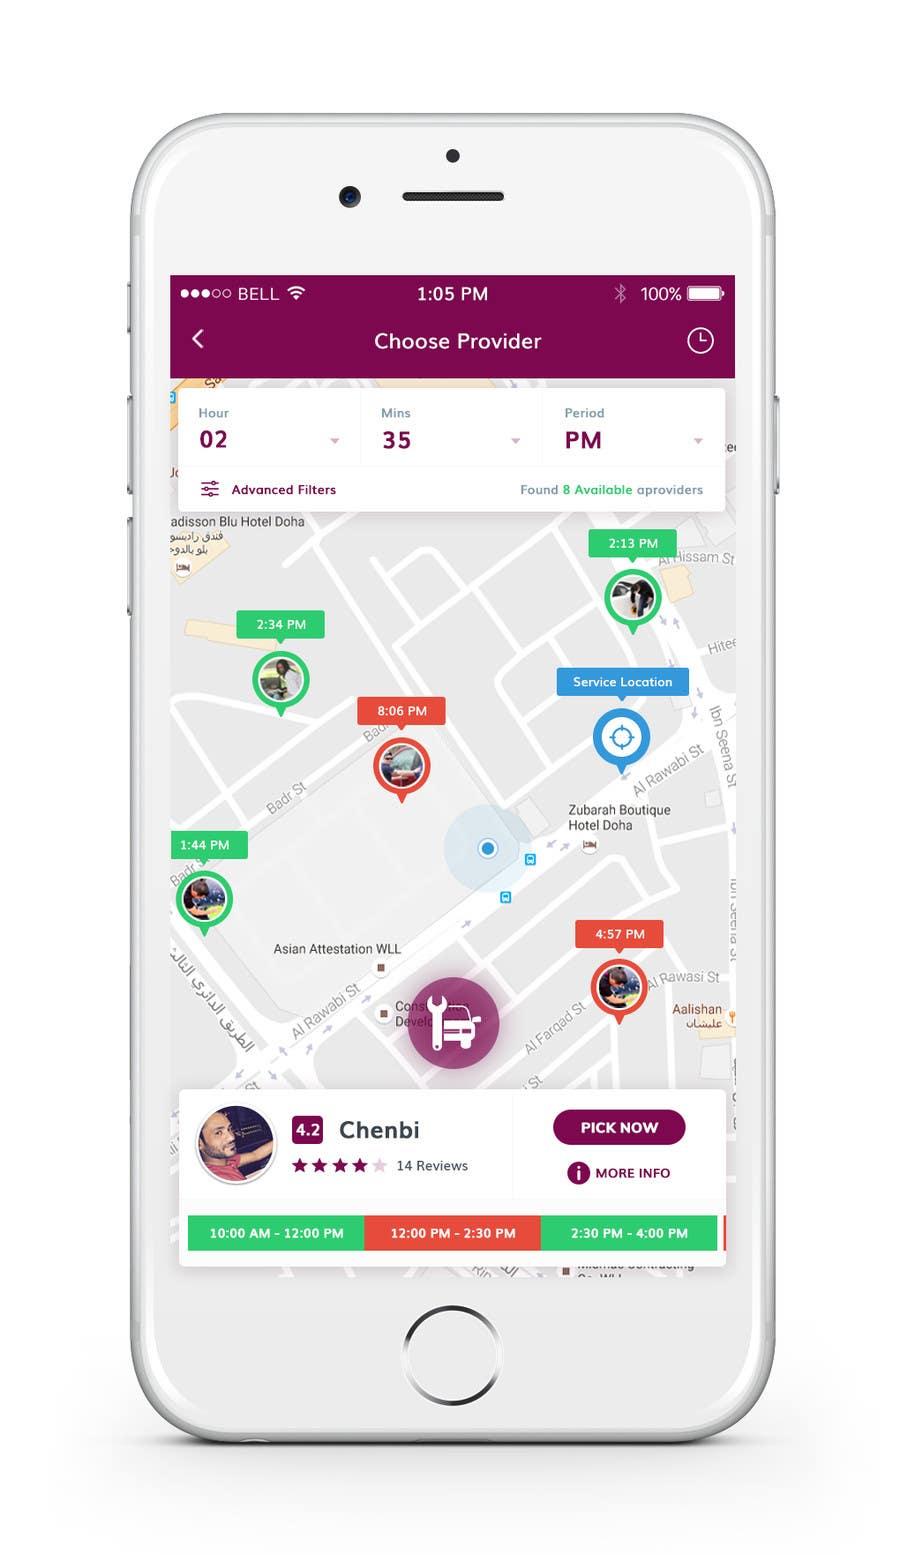 Proposition n°23 du concours Roadside assistance (Two App Screens)